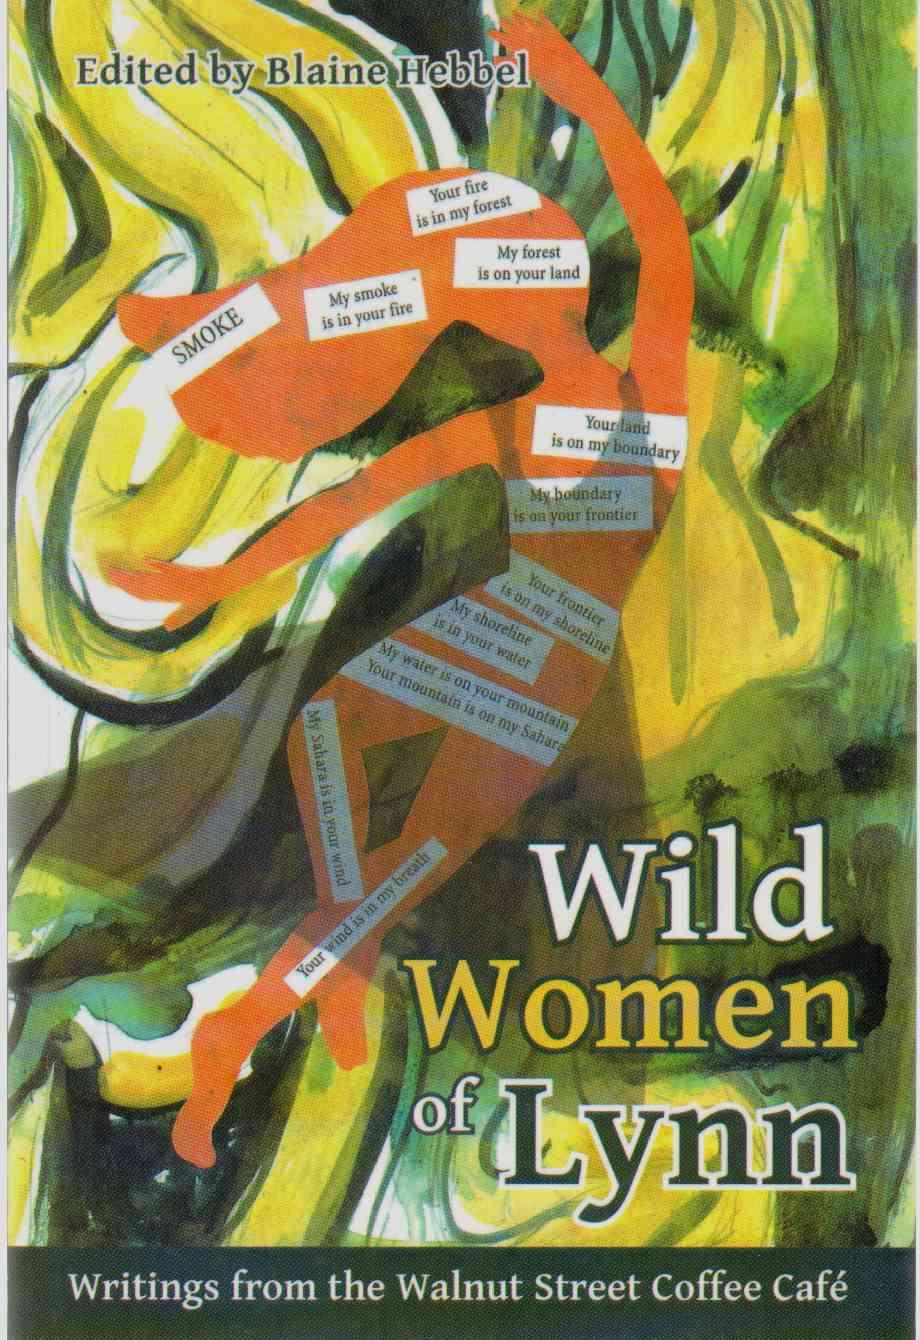 WILD WOMEN OF LYNN Writings from the Walnut Street Coffee Café, Hebbel, Blaine; edited by